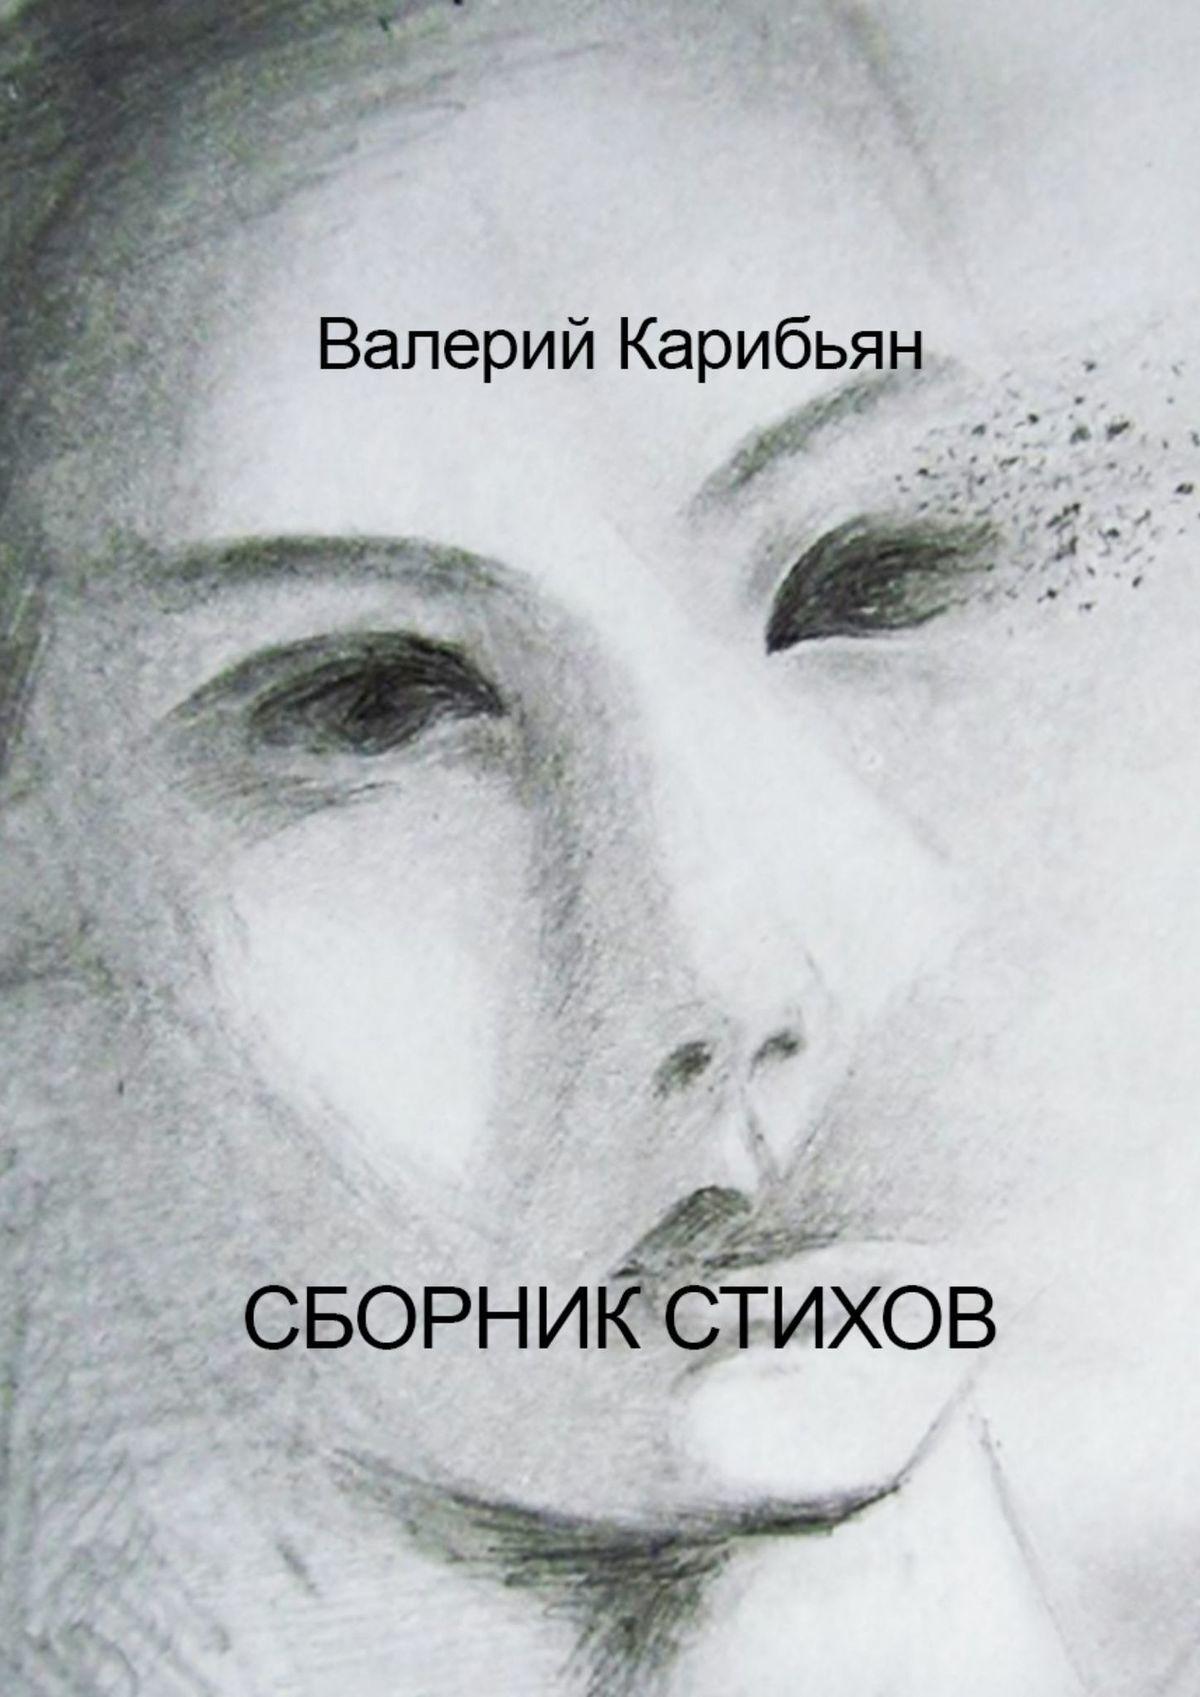 Валерий Карибьян Сборник стихов валерий кузьмин пошли… сборник стихов заметок миниатюр